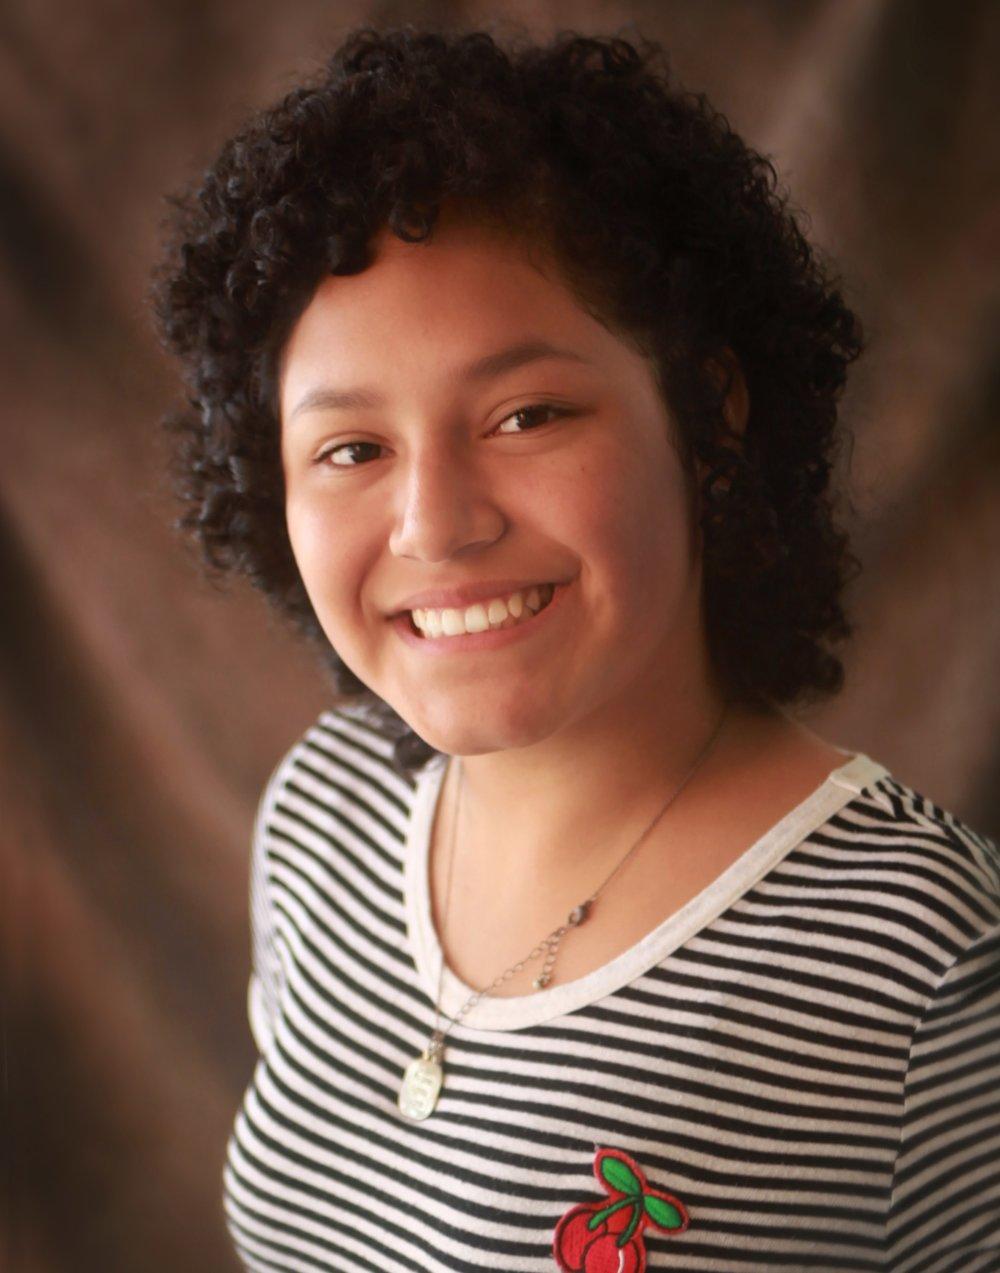 Jeslyn Bautista, 14, Plano